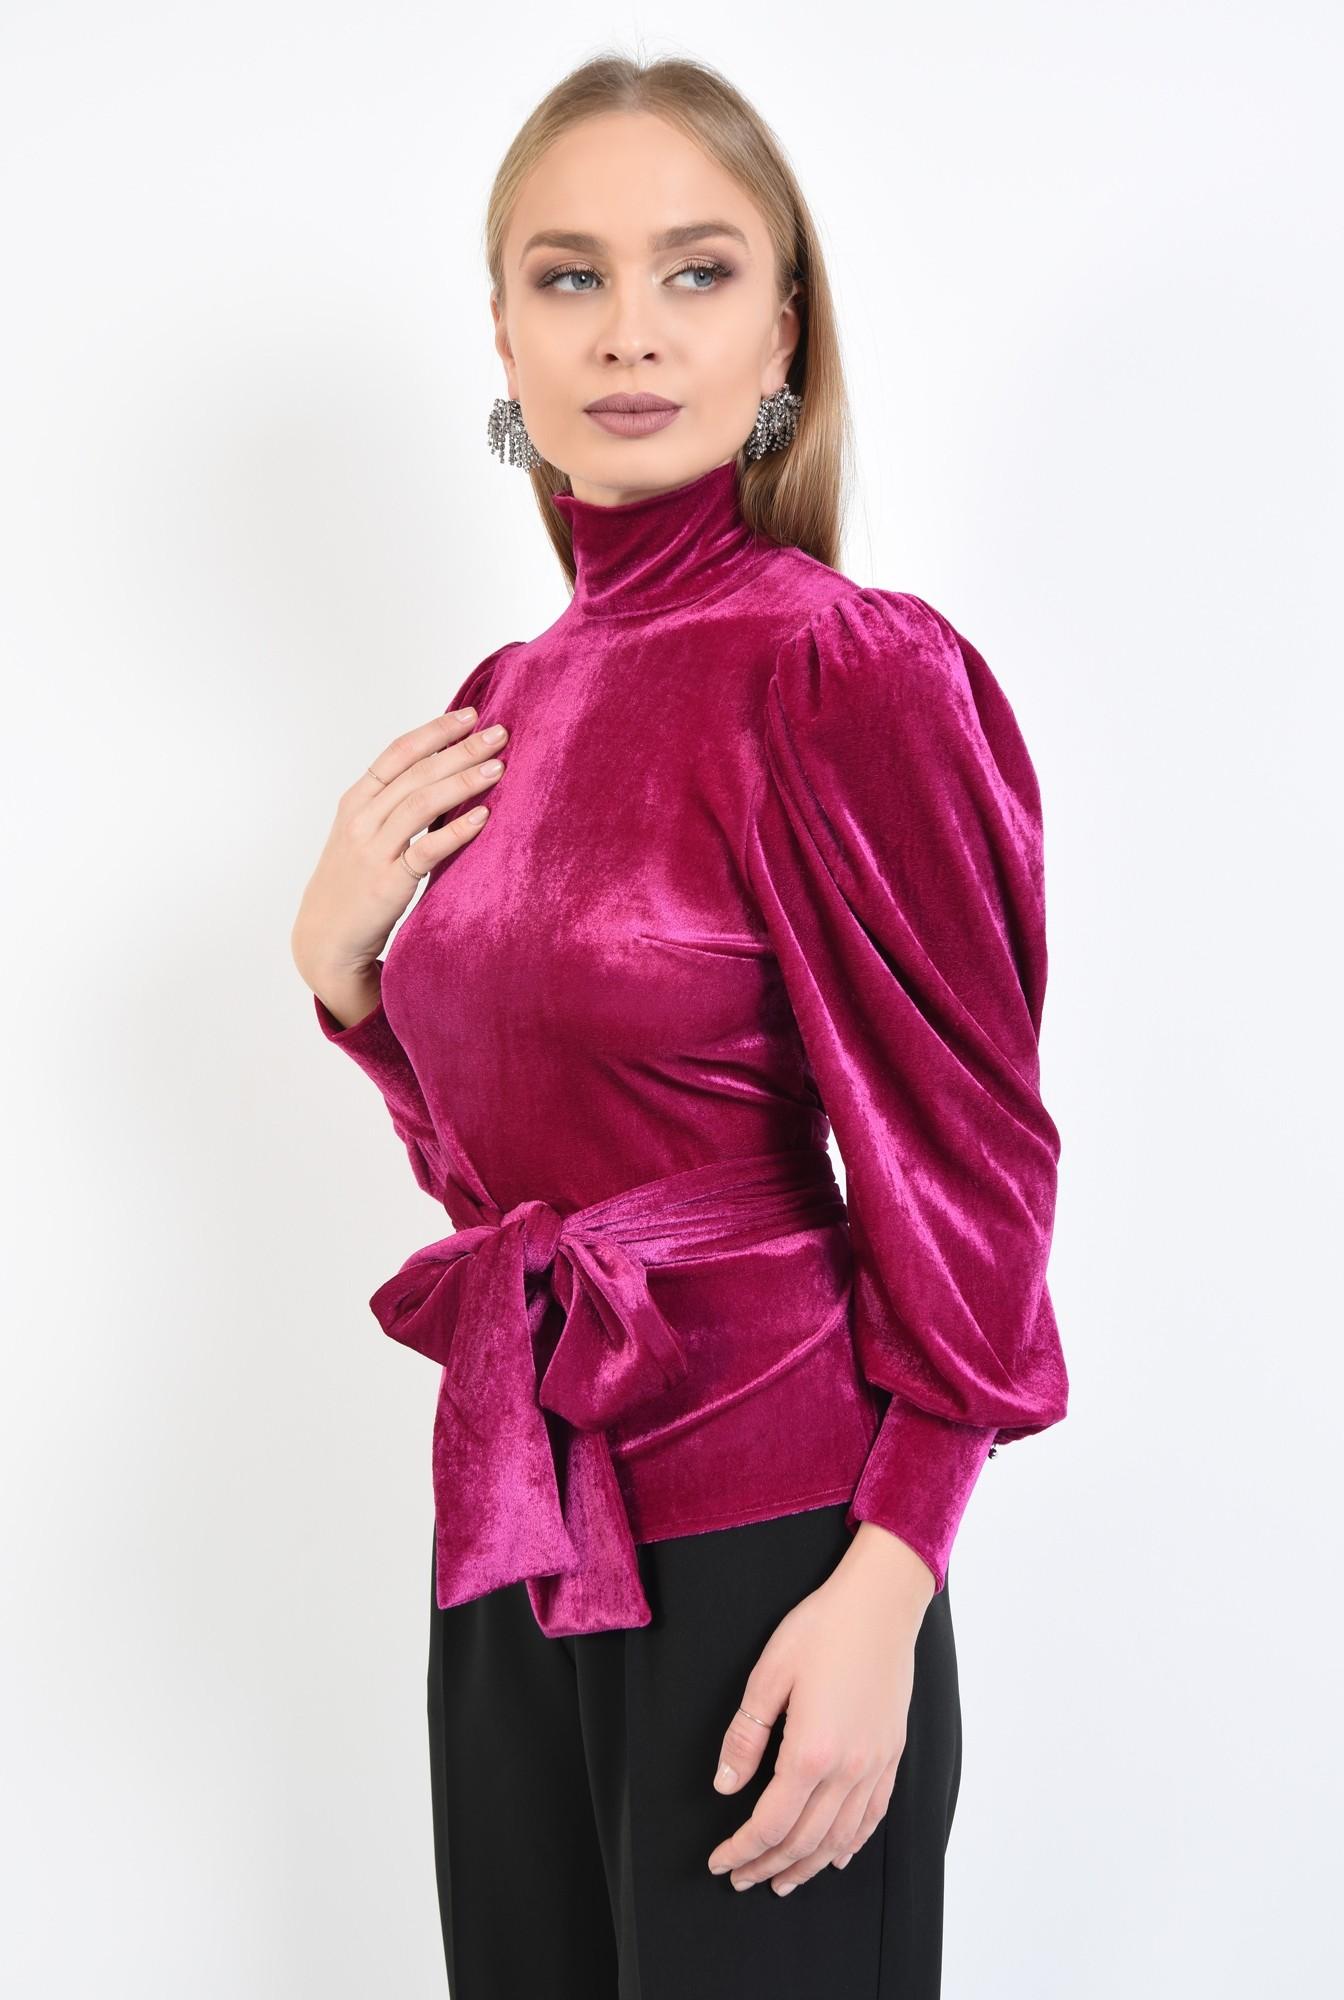 0 - 360 - bluza eleganta, roz ciclam, maneci bufante, funda la talie